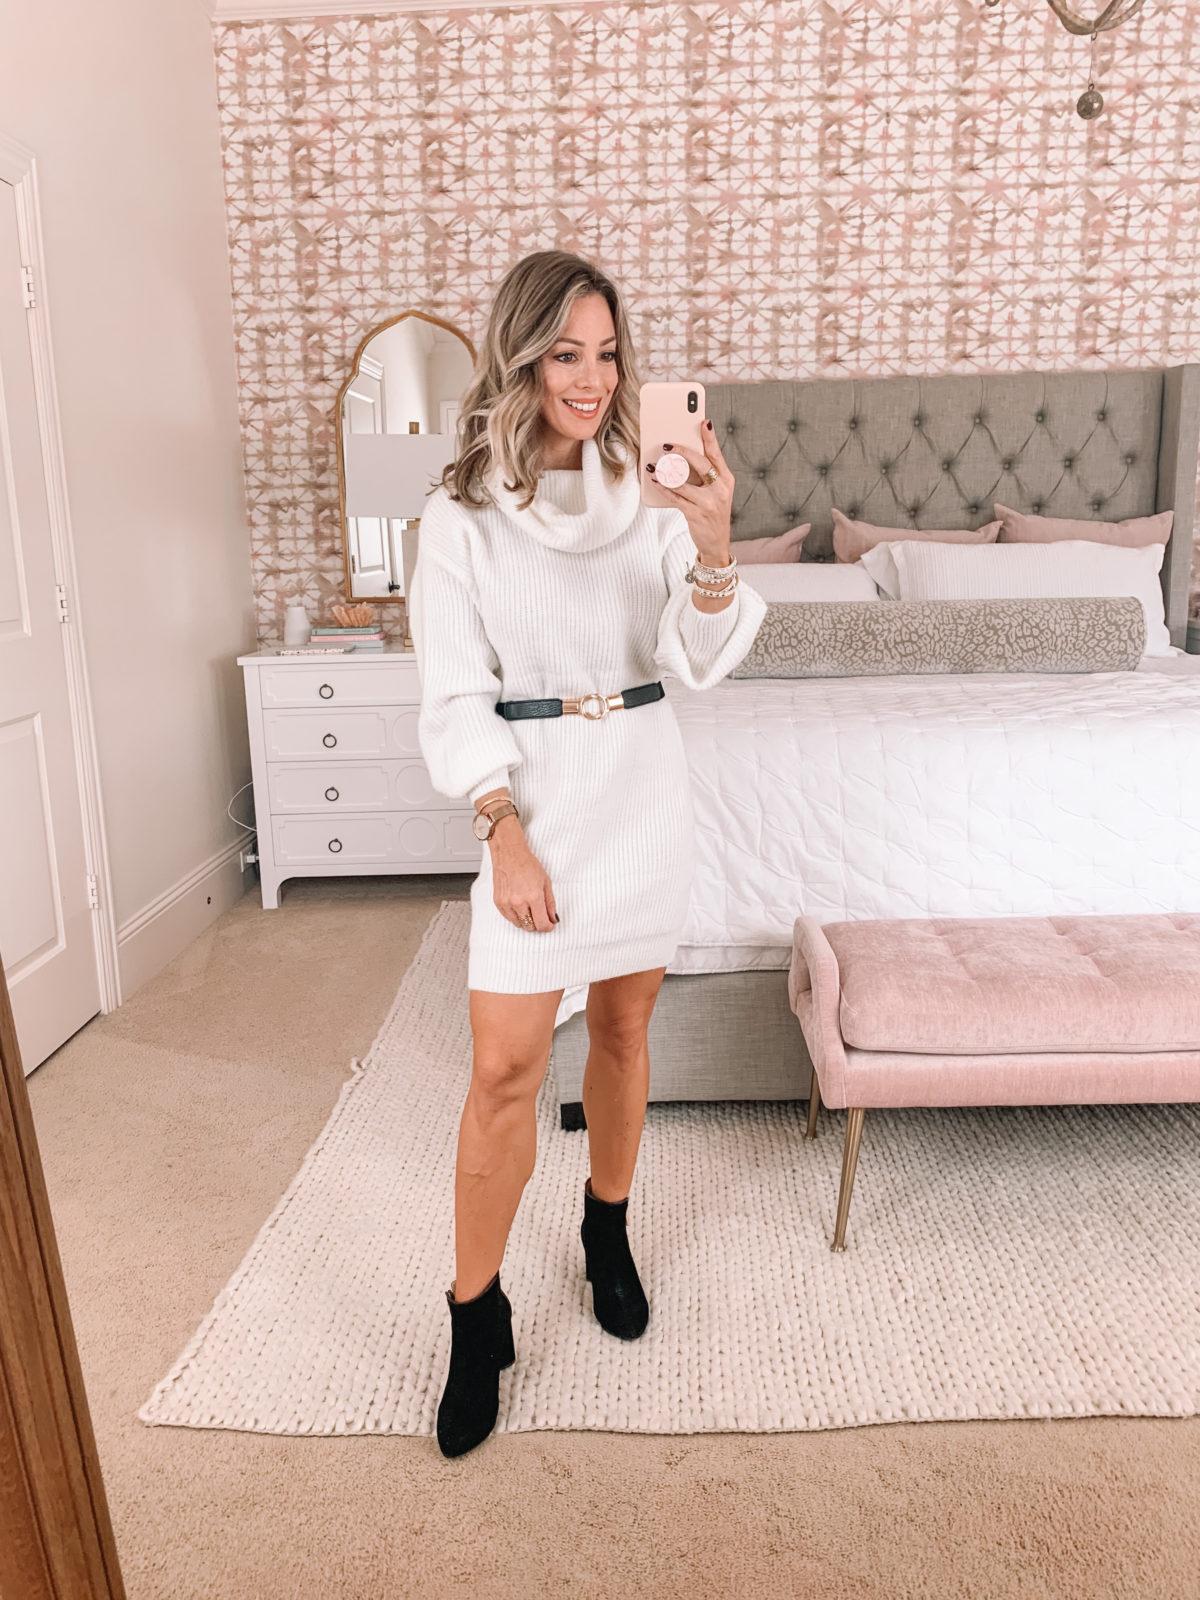 Nordstrom Rack, White Sweater Dress, Booties, Elastic Belt